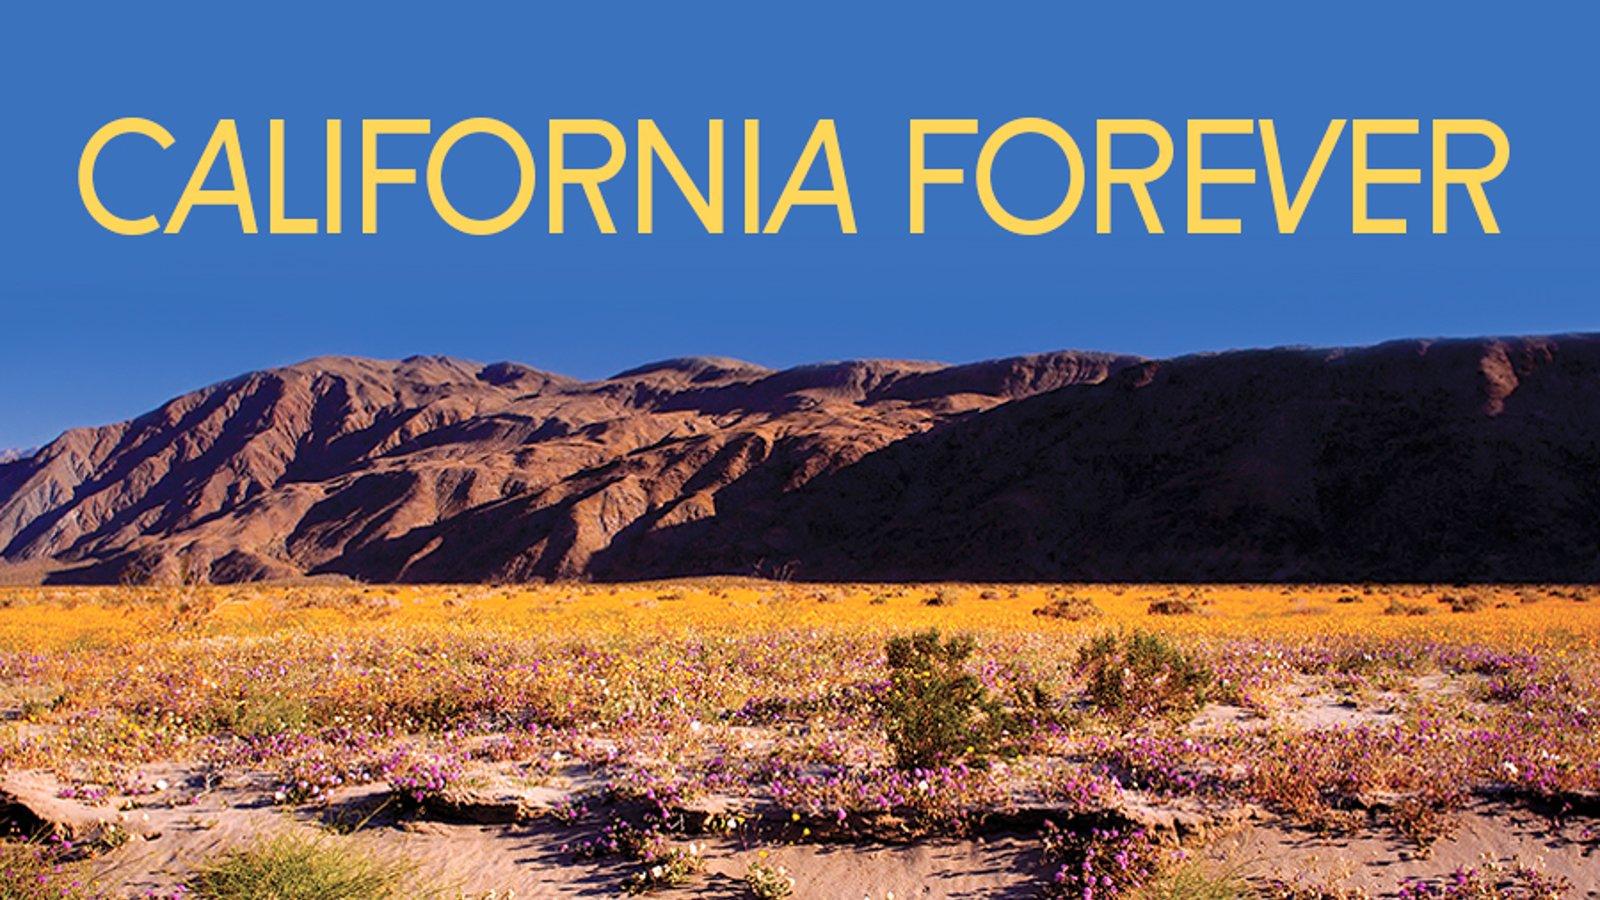 California Forever Series